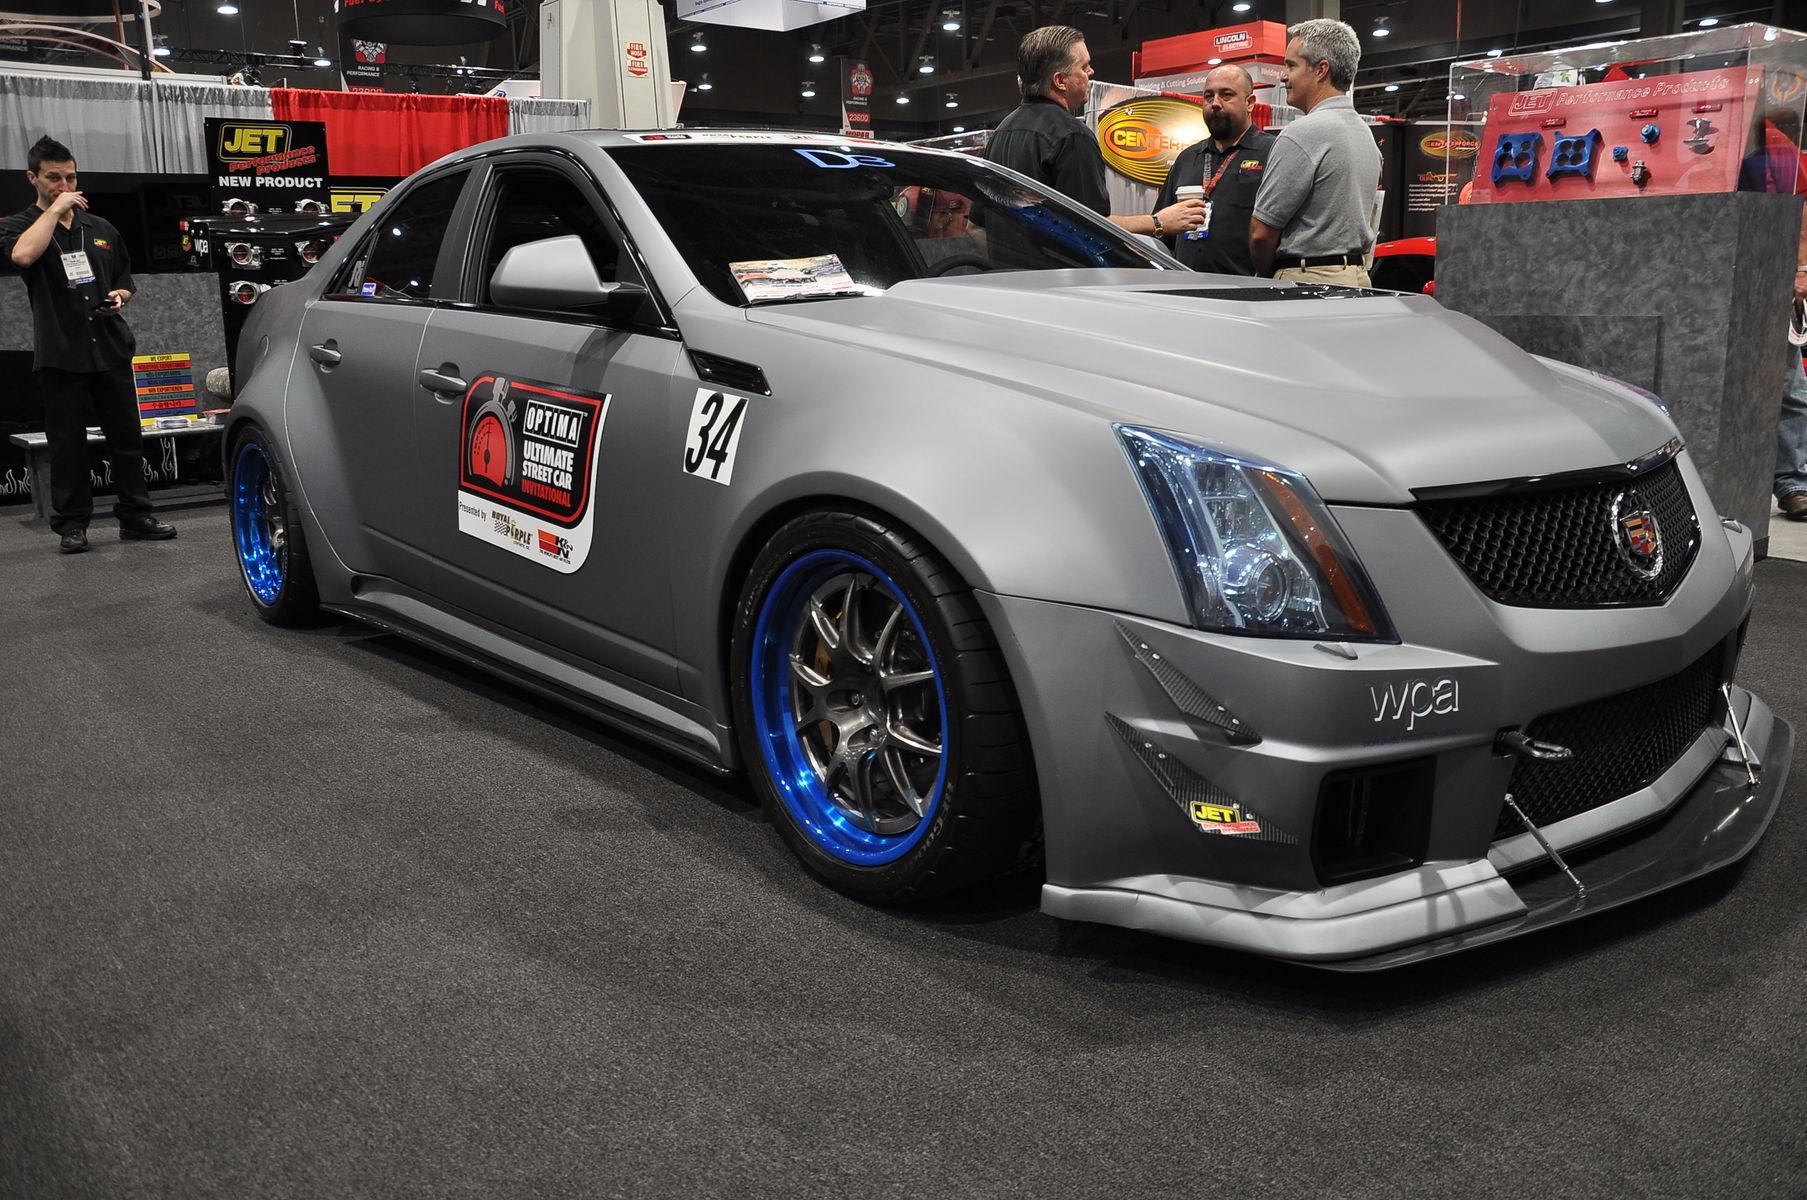 2013 Cadillac CTS-V   2013 Cadillac CTS-V